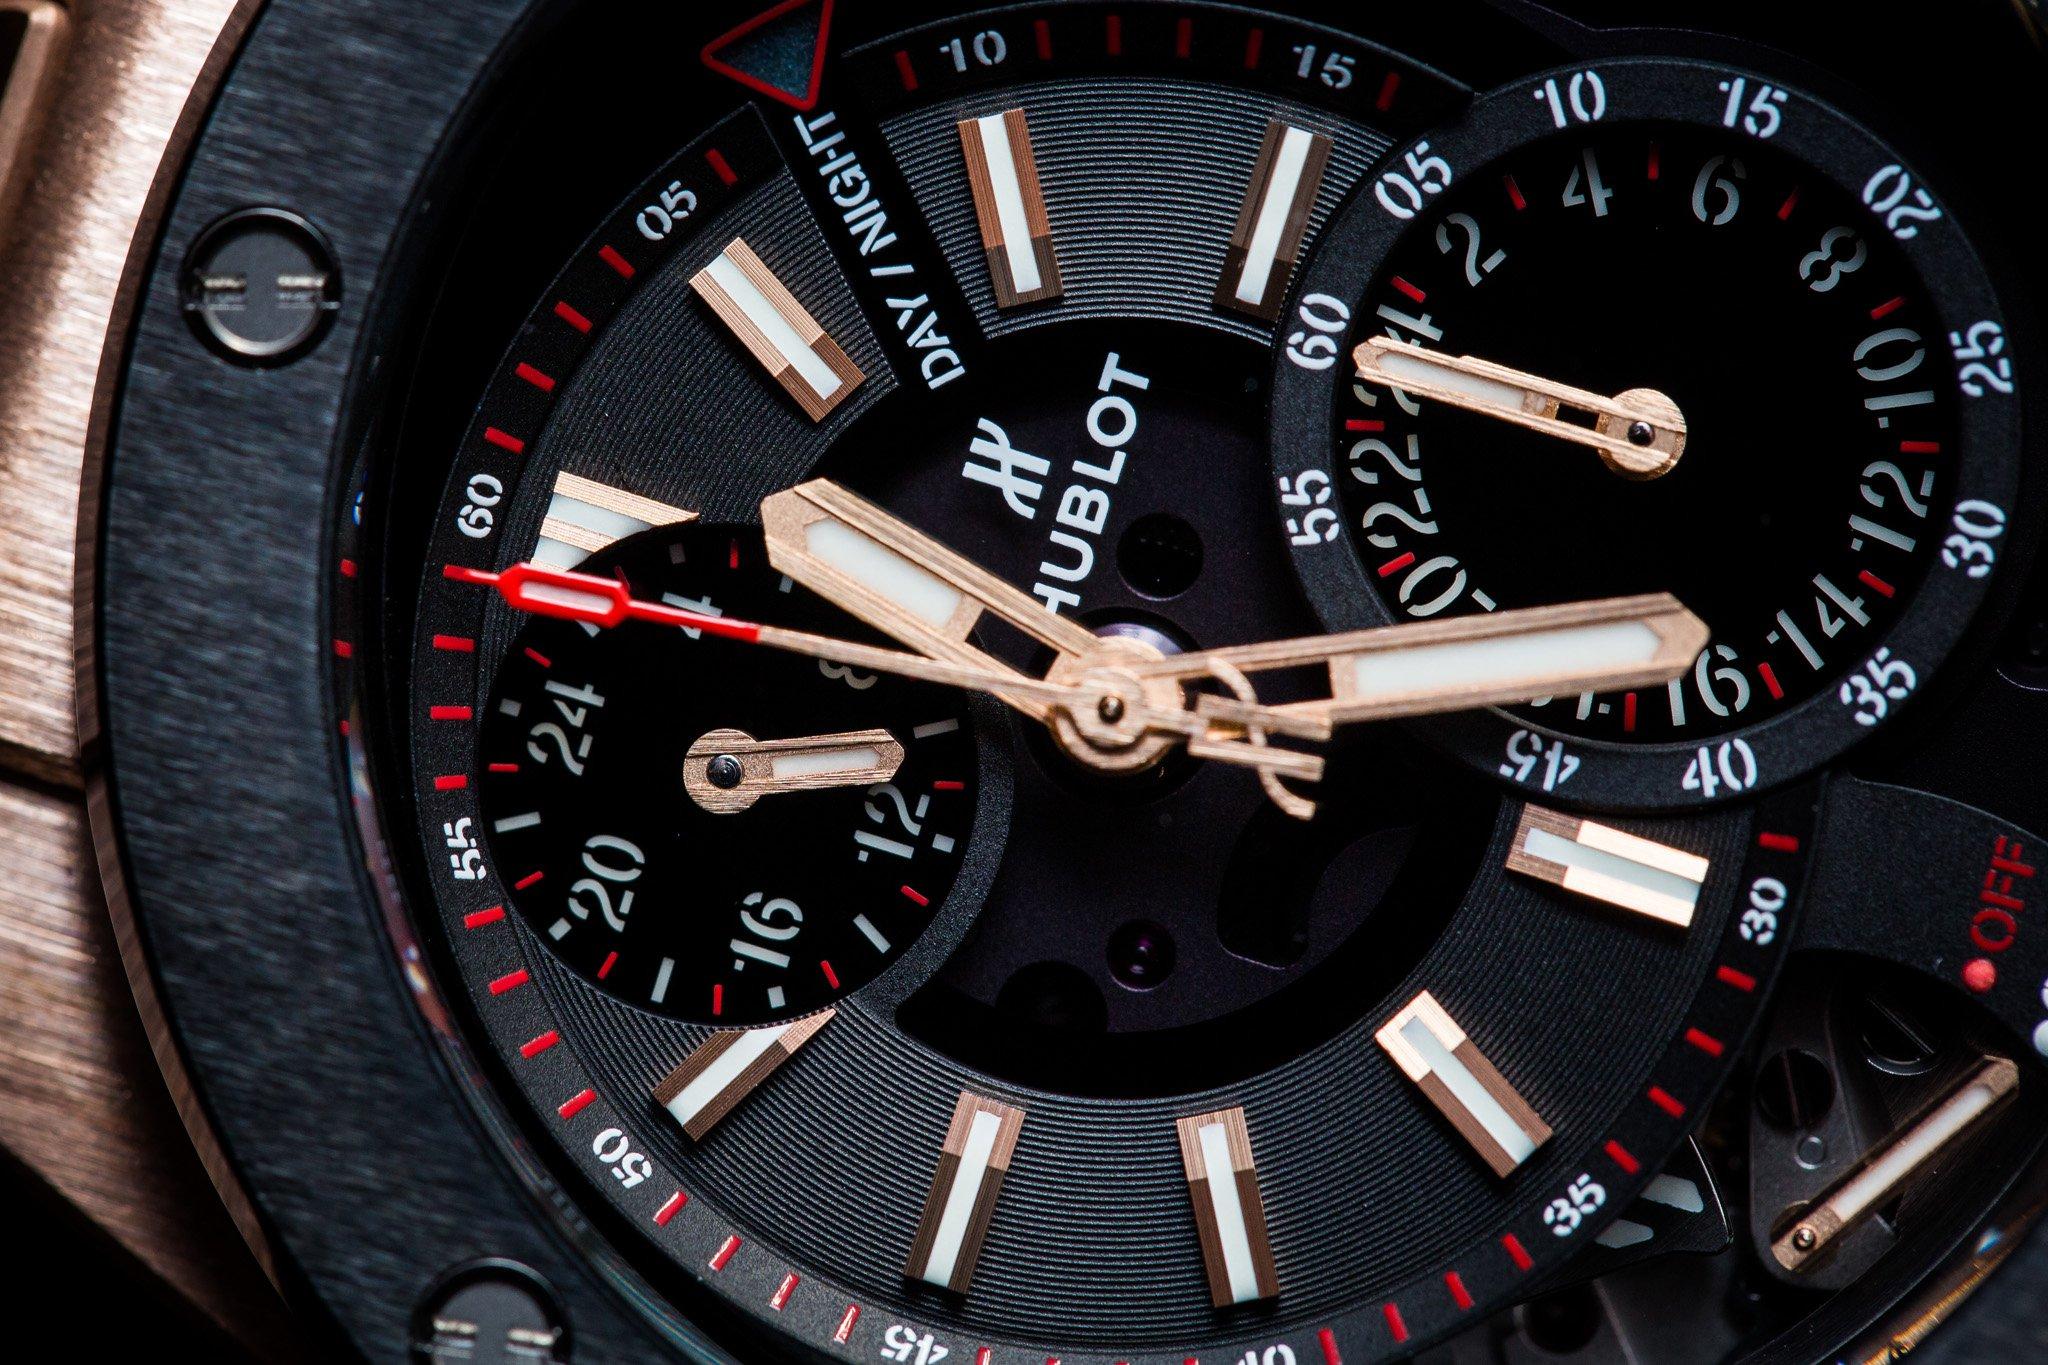 Hublot-Big-Bang-Alarm-Repeater-Watch-in-King-Gold-Close-Up-21